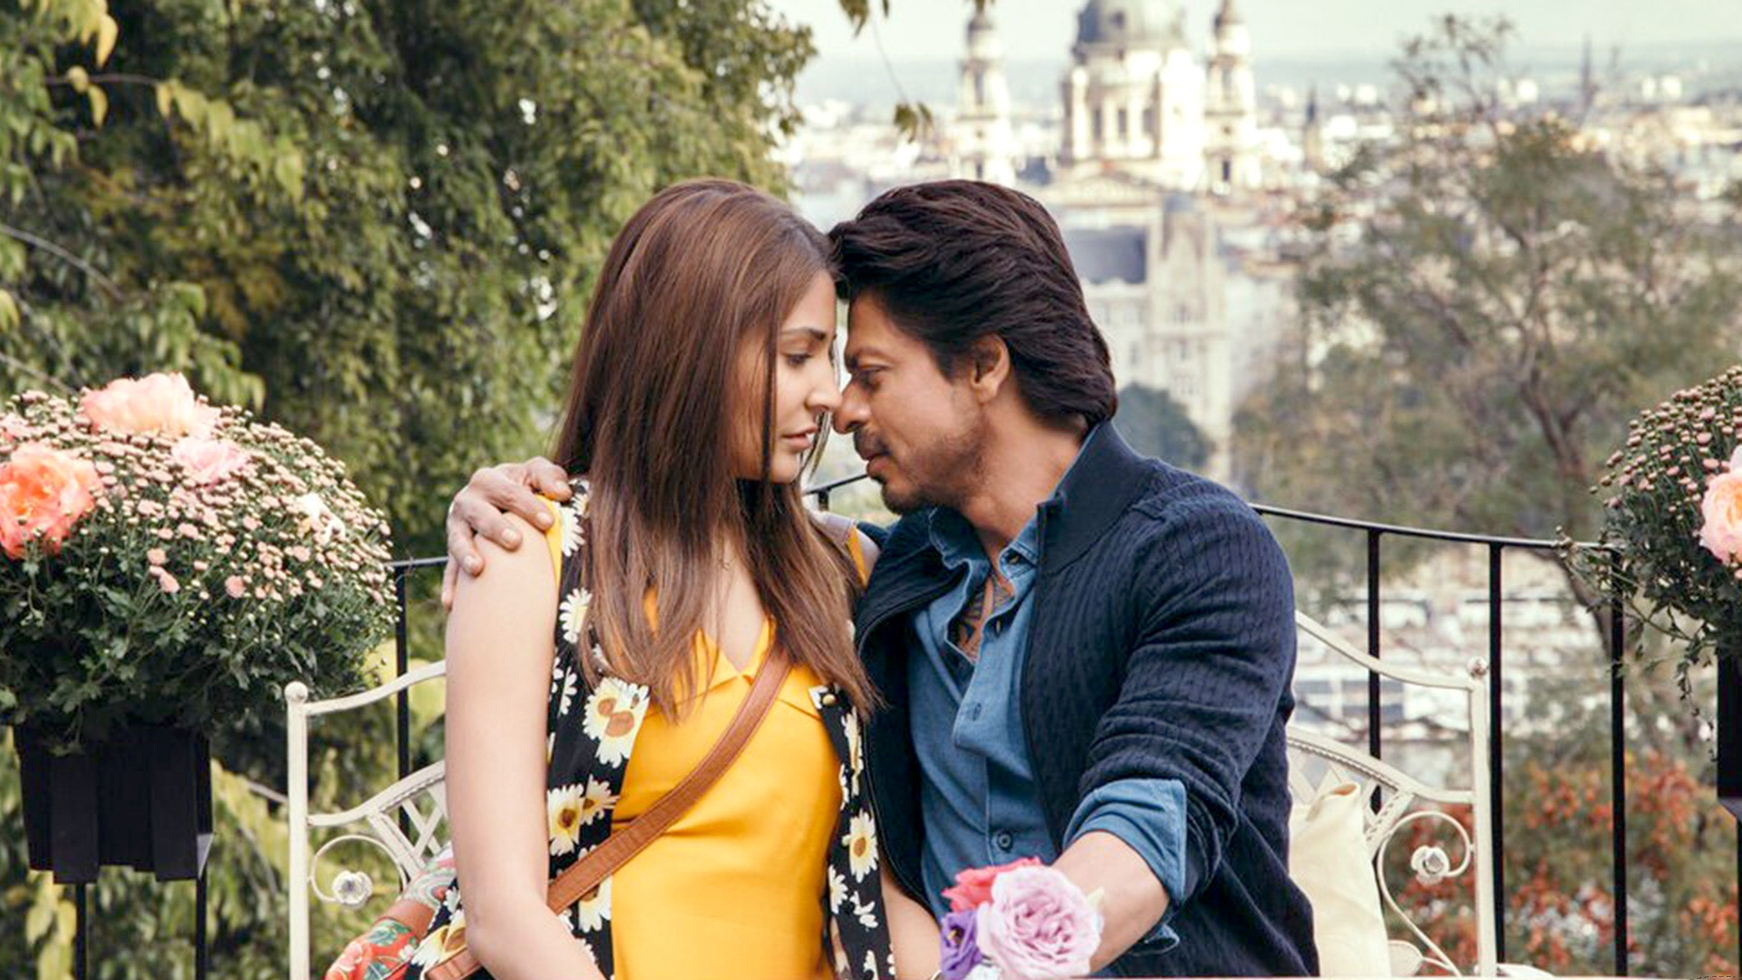 Shah Rukh Khan & Anushka Sharma in the turd that was  Jab Harry Met Sejal